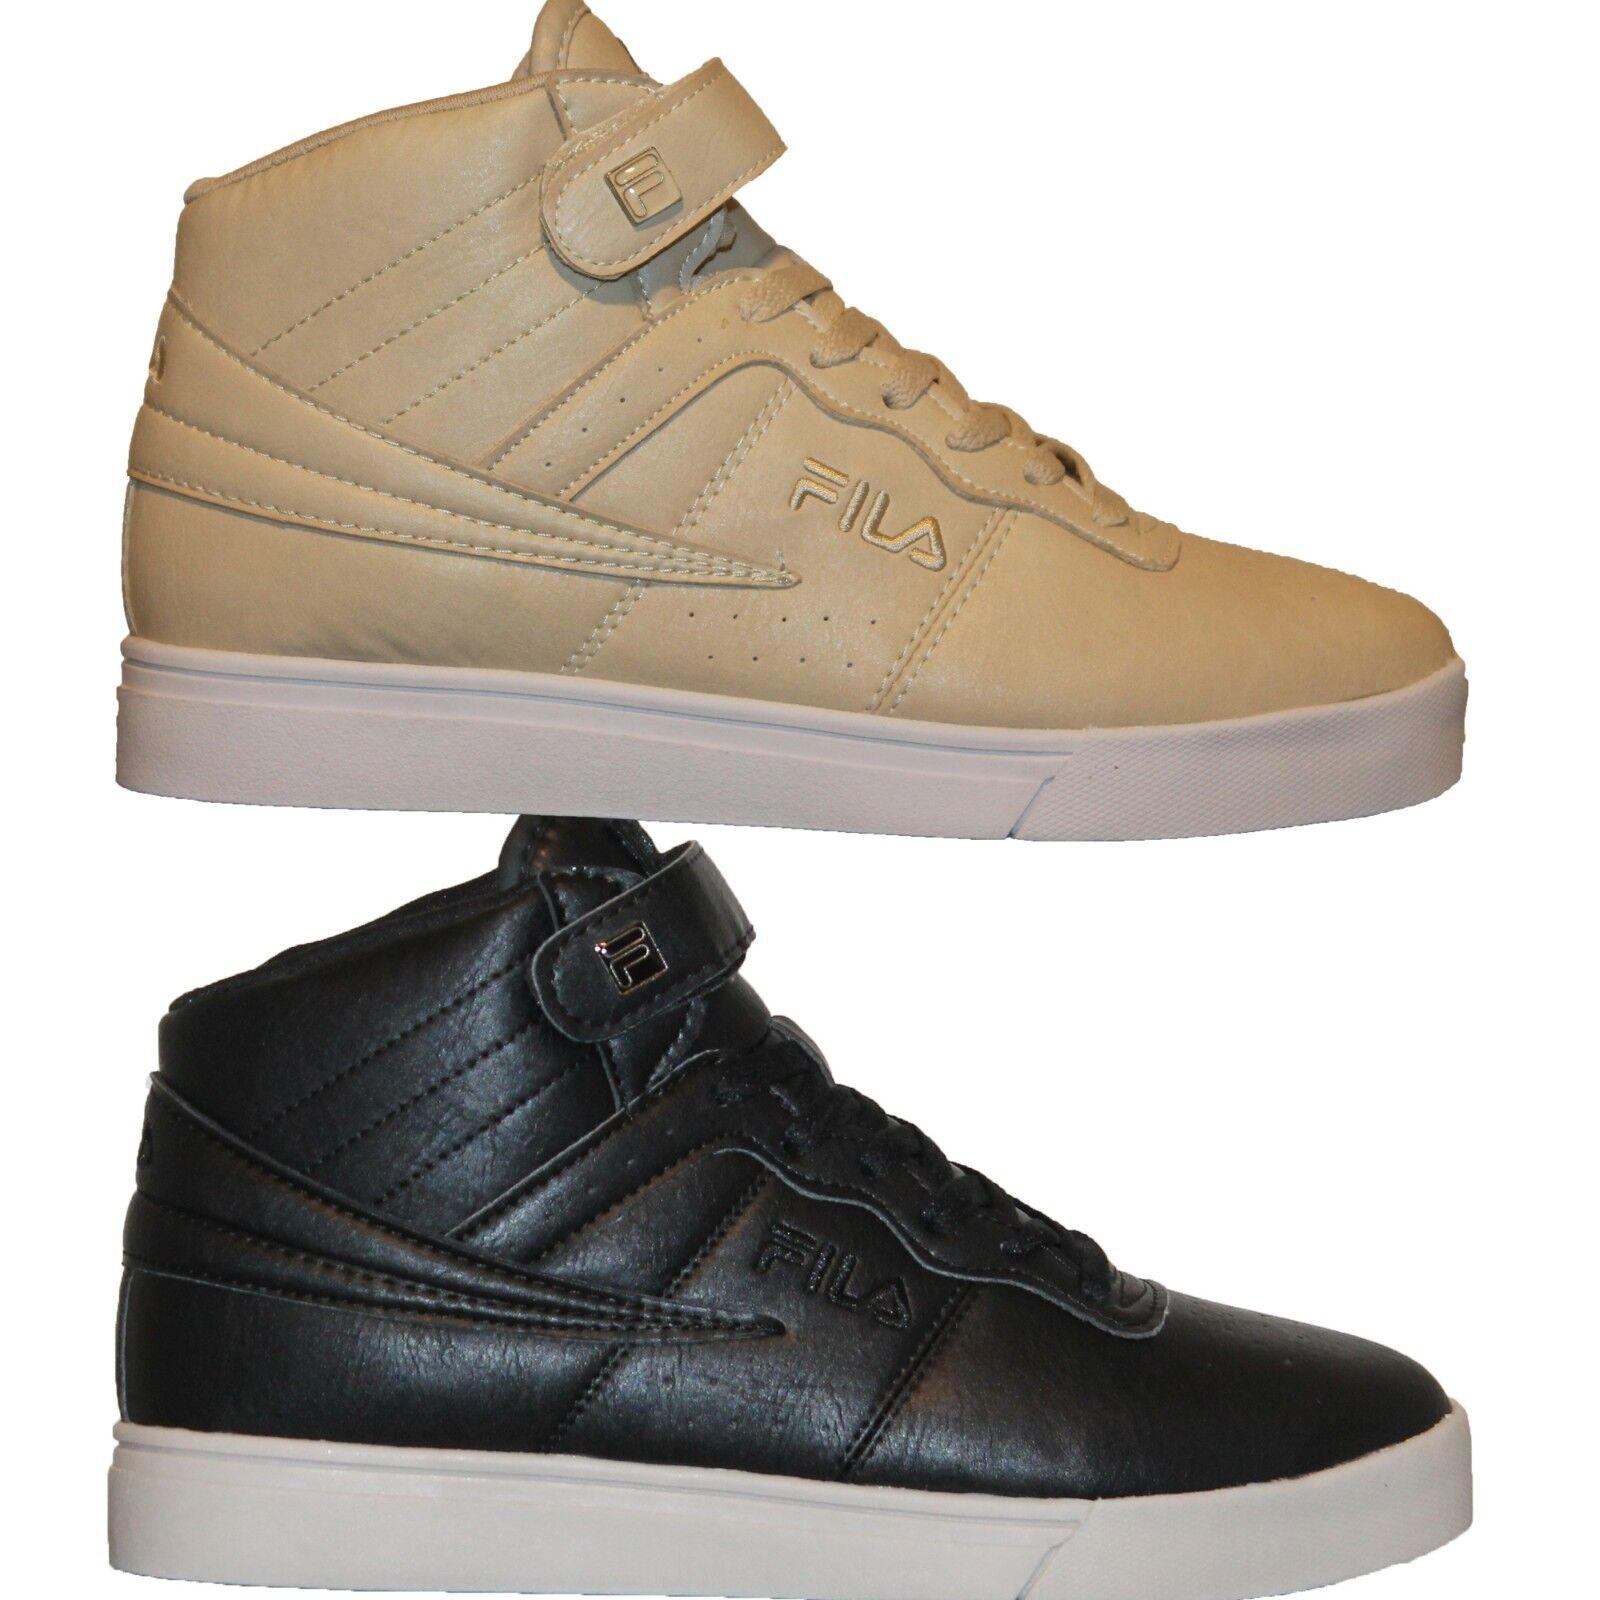 Mens FILA VULC 13 MP Mid Plus DISTRESS Retro Basketball Shoes Sneakers Brand discount